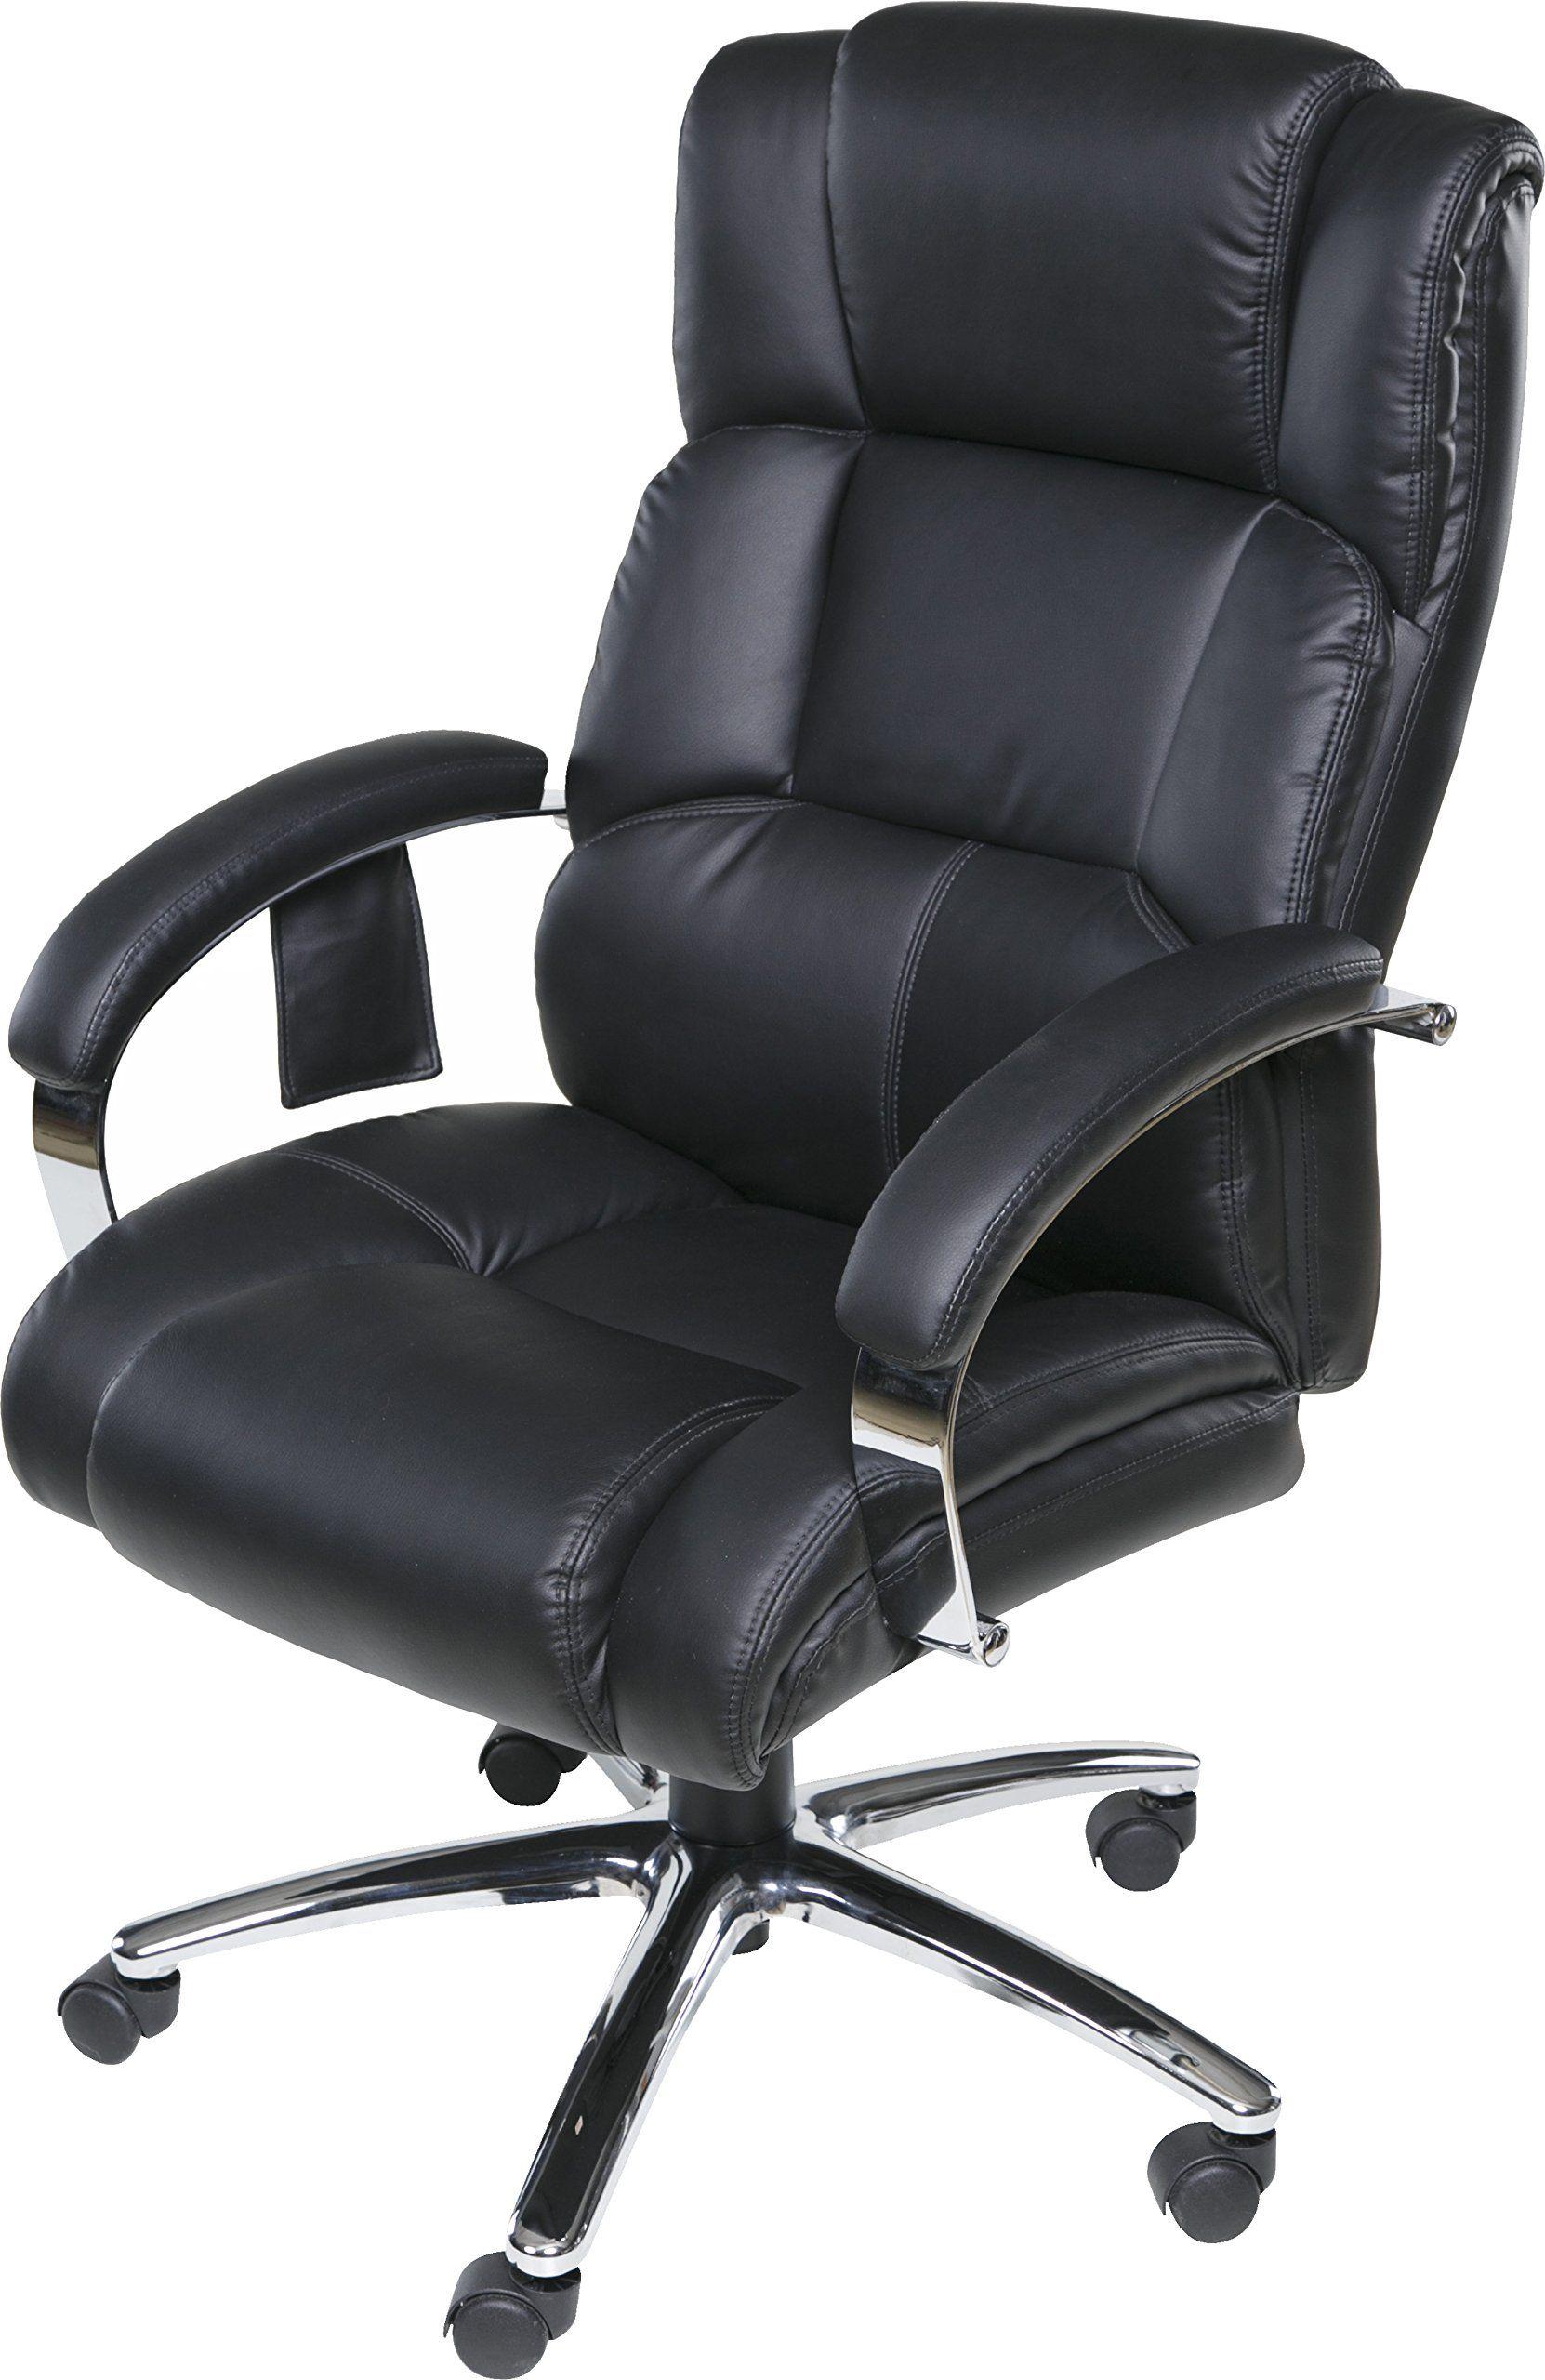 Relaxzen Executive 6Motor Massage Chair with Lumbar